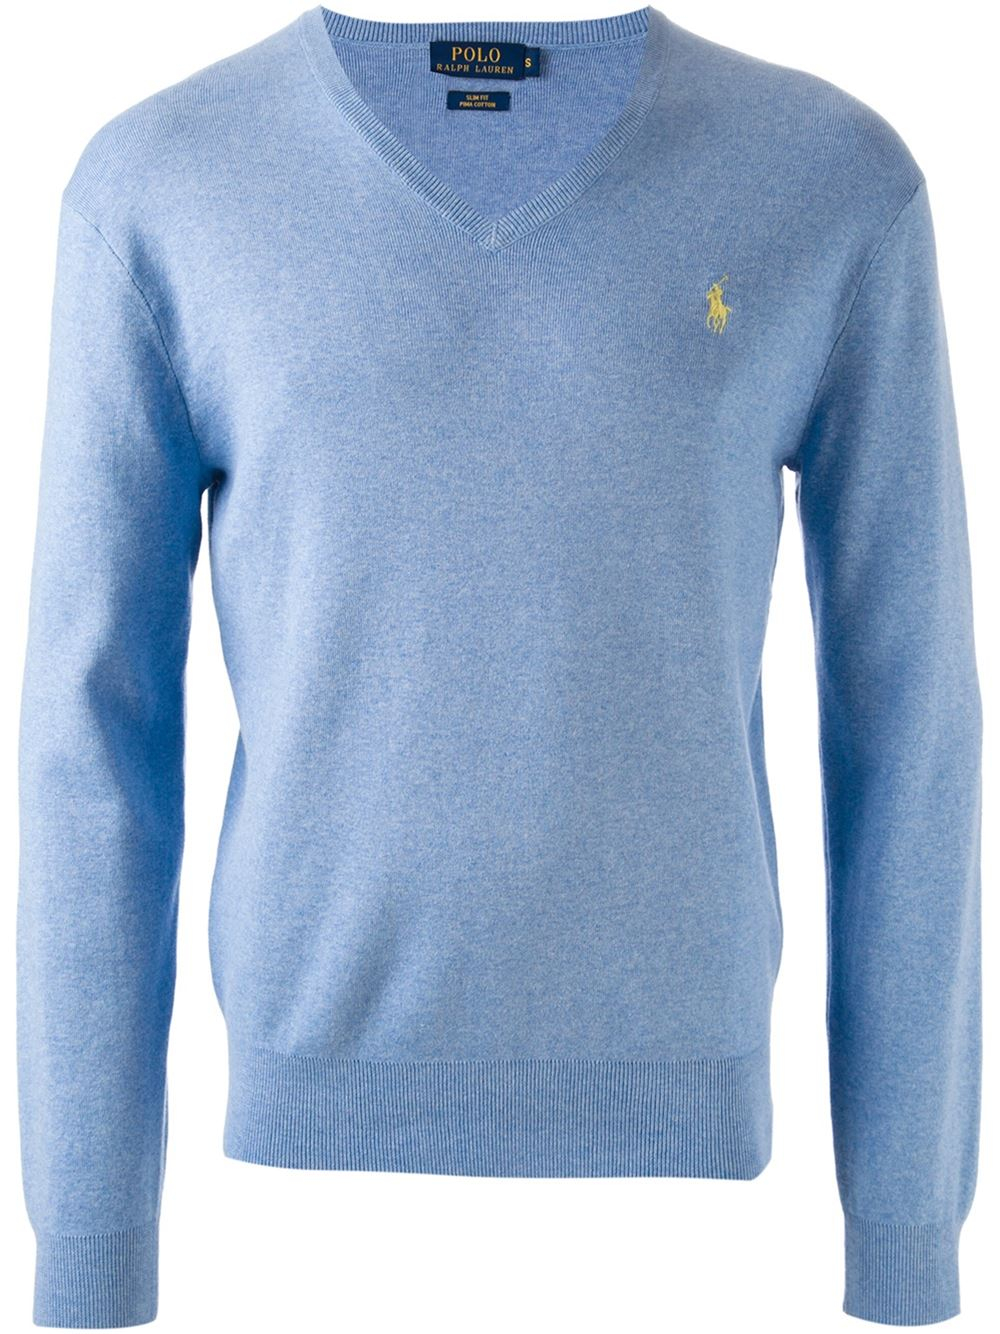 polo ralph lauren v neck sweater in blue for men lyst. Black Bedroom Furniture Sets. Home Design Ideas